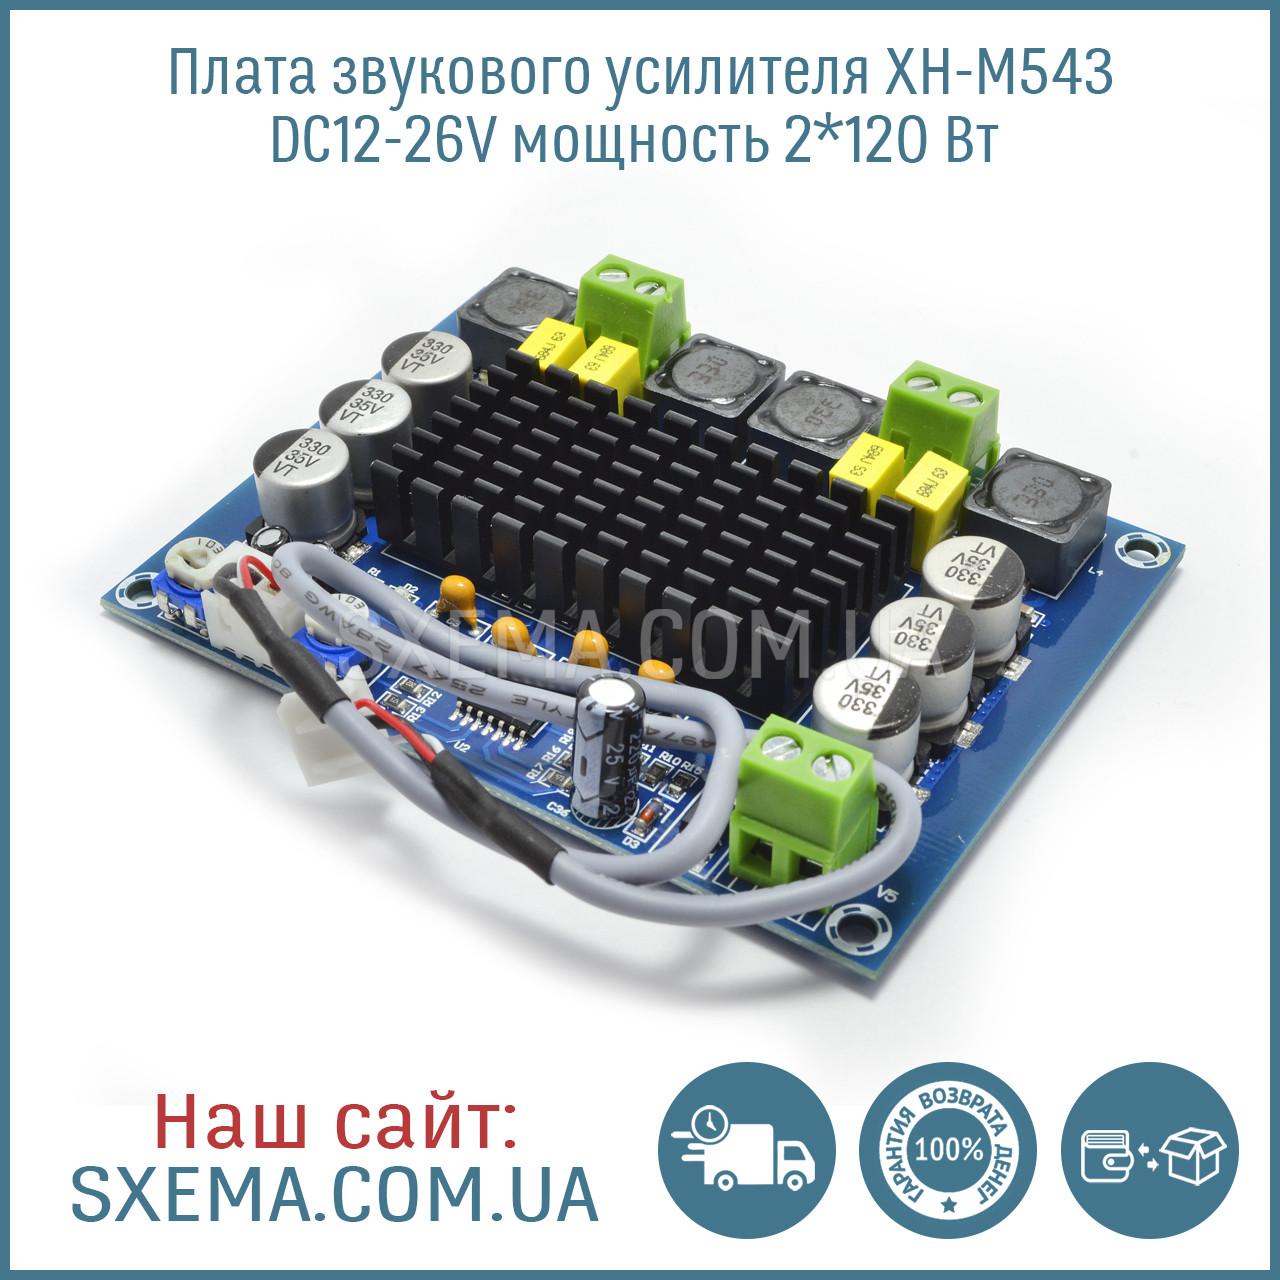 Плата звукового усилителя XH-M543 DC12-26V мощность 2*120 Вт TPA3116D2